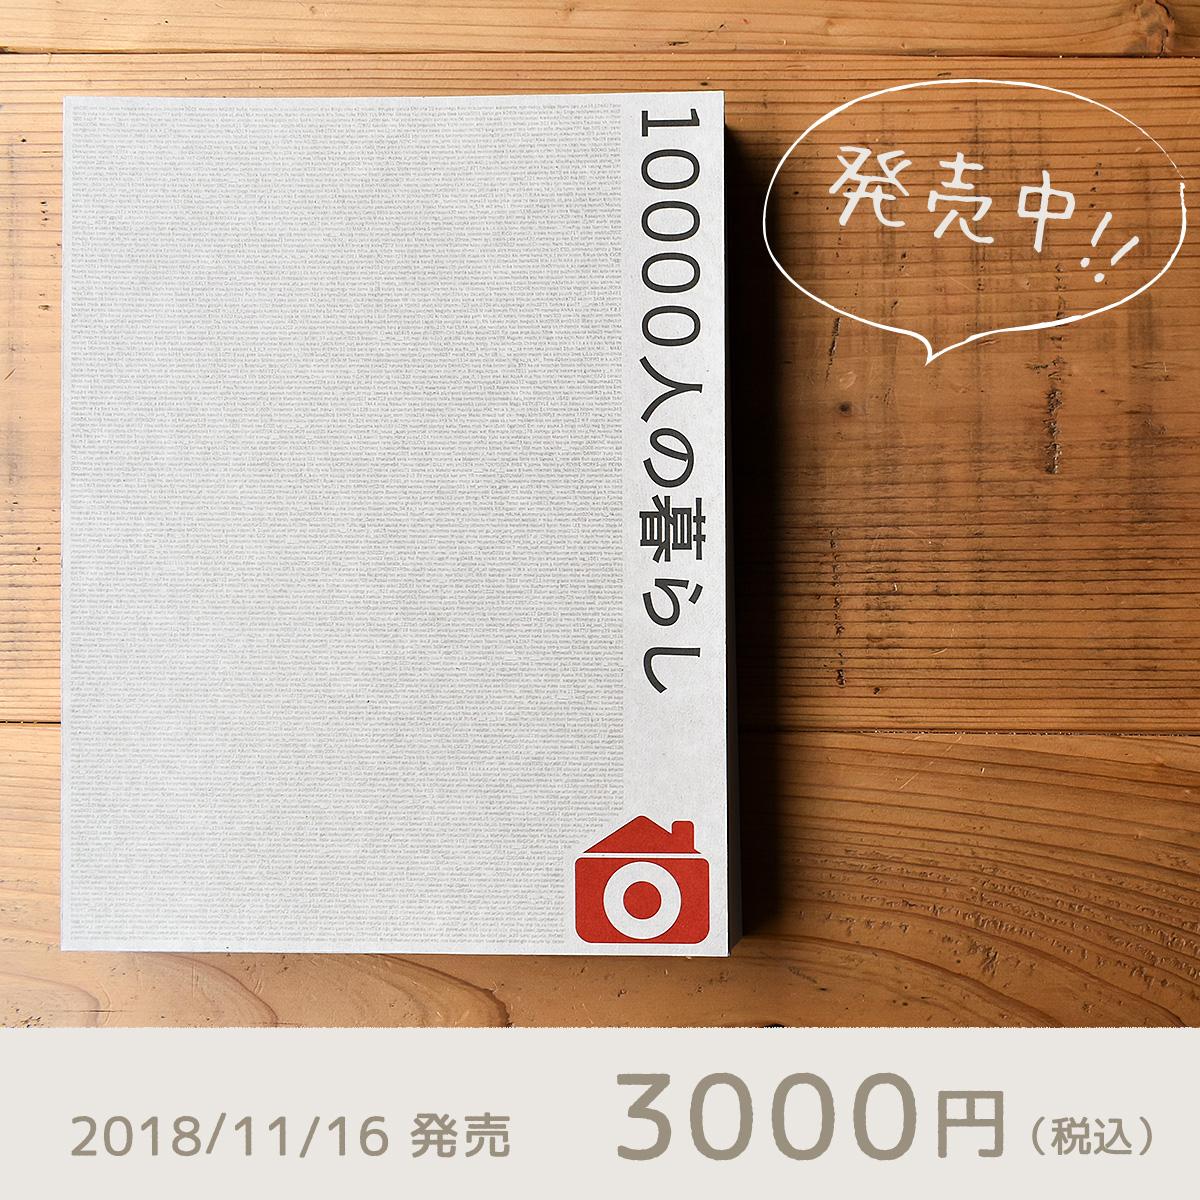 「RoomClip 10000人の暮らし本」販売中!